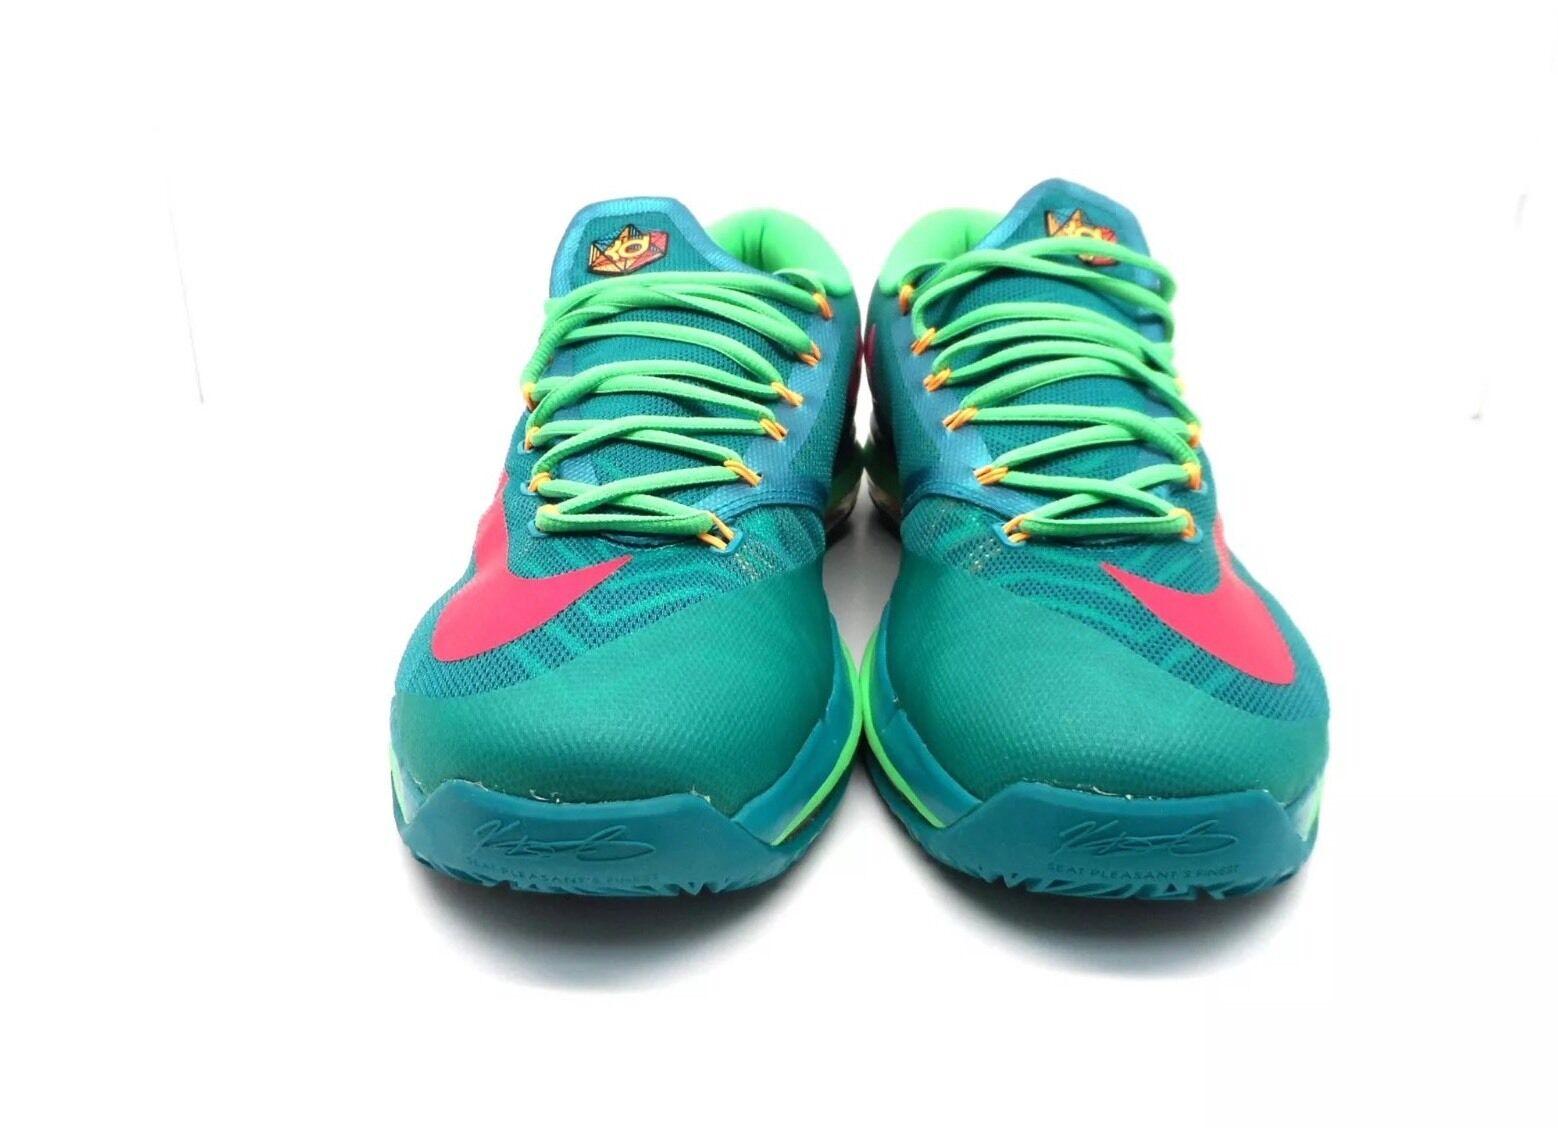 2014 Nike Zoom KD VI 6 Elite Hero Turbo Green Vivid Pink Size 13 VNDS